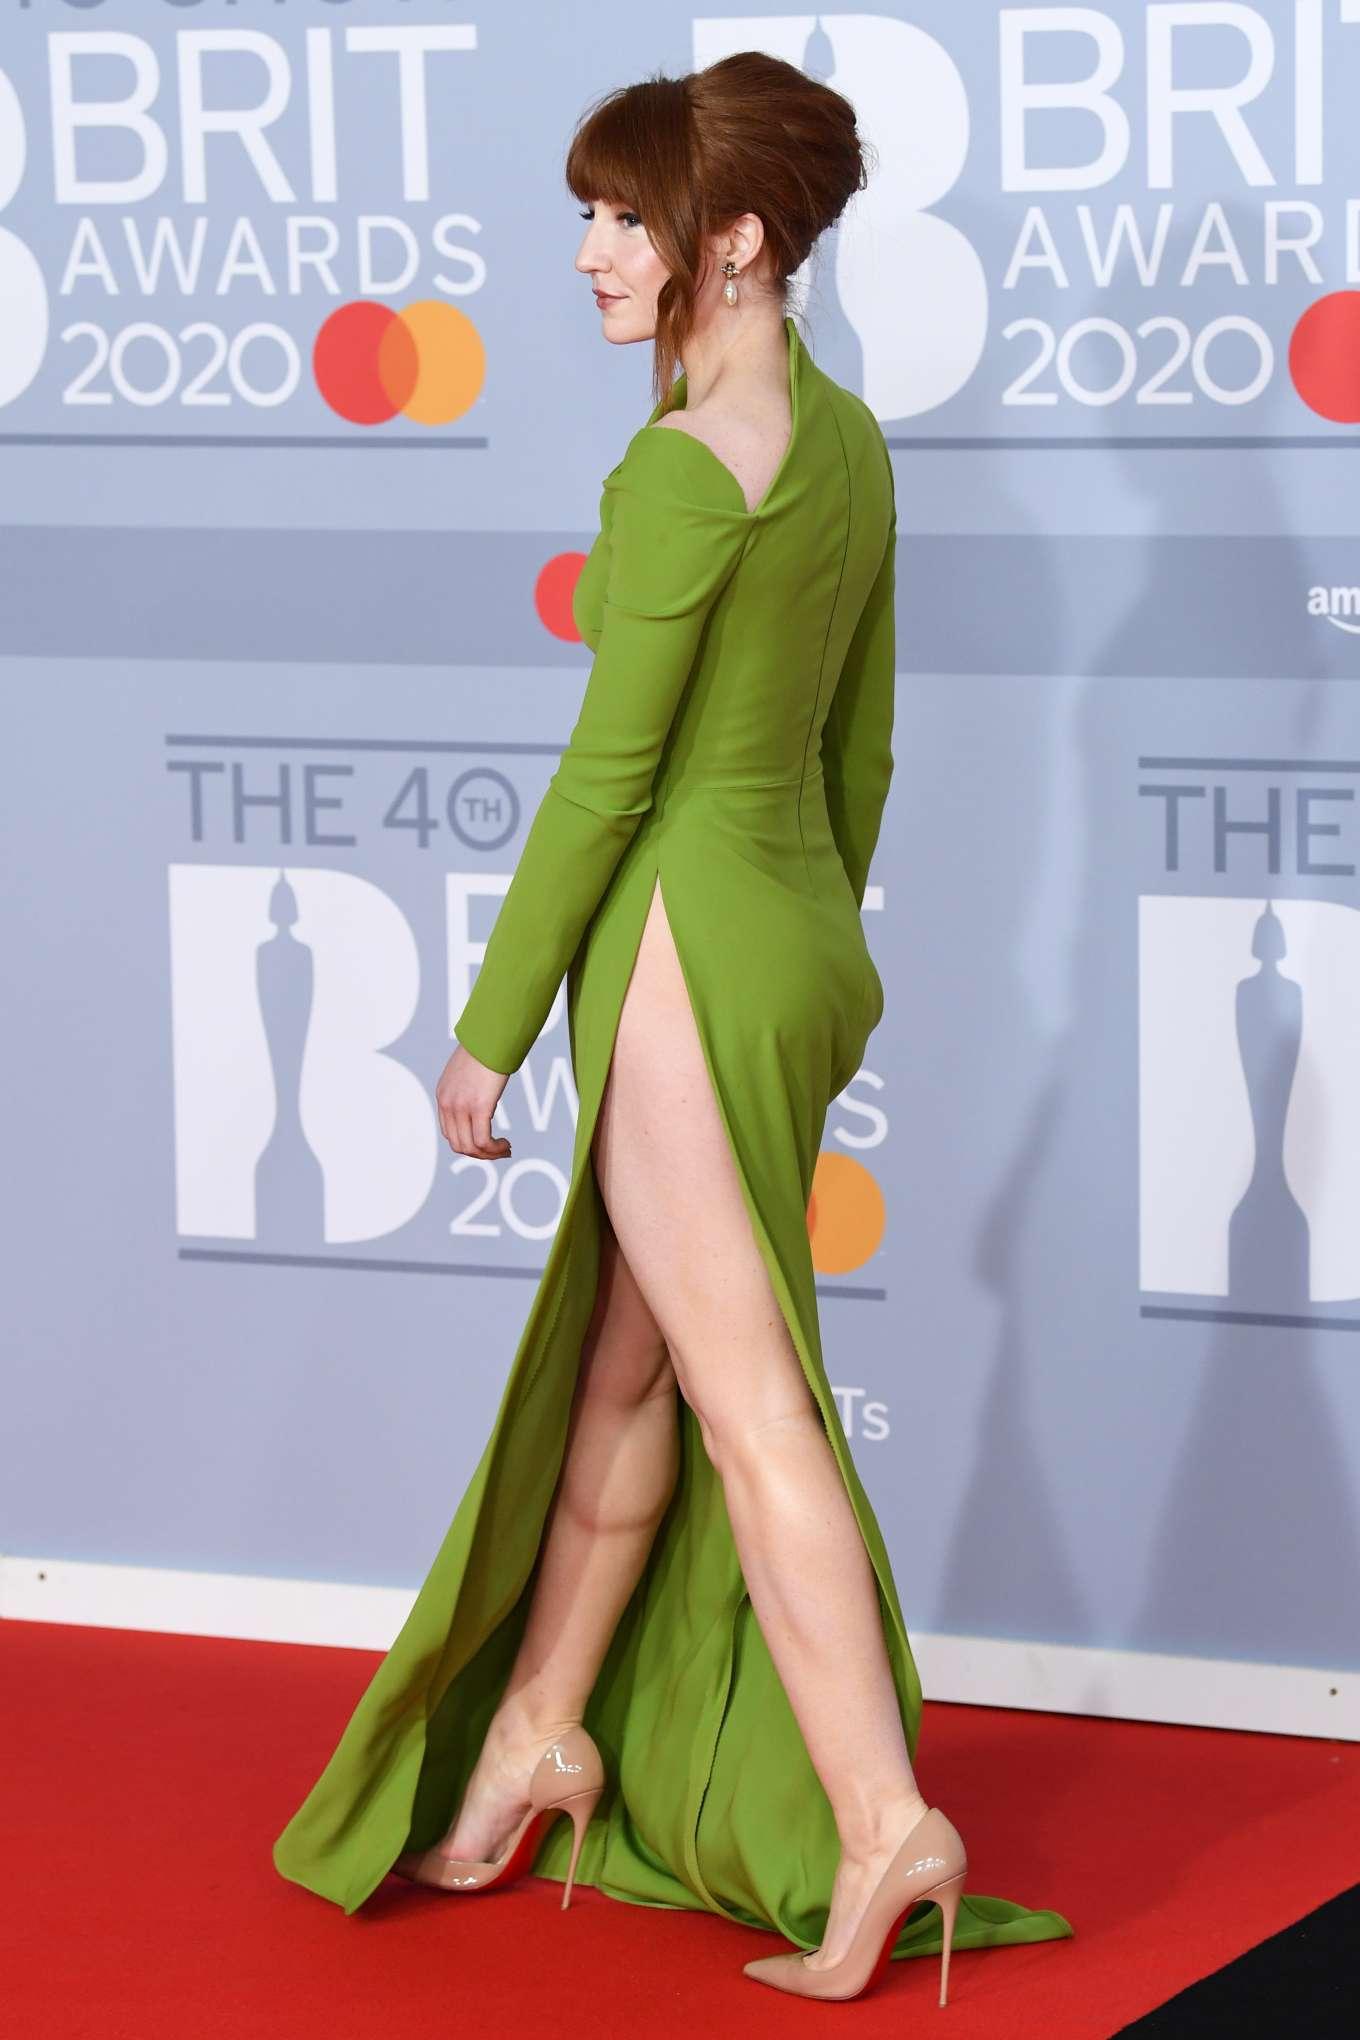 Nicola Roberts - In green split dress at 2020 BRIT Awards